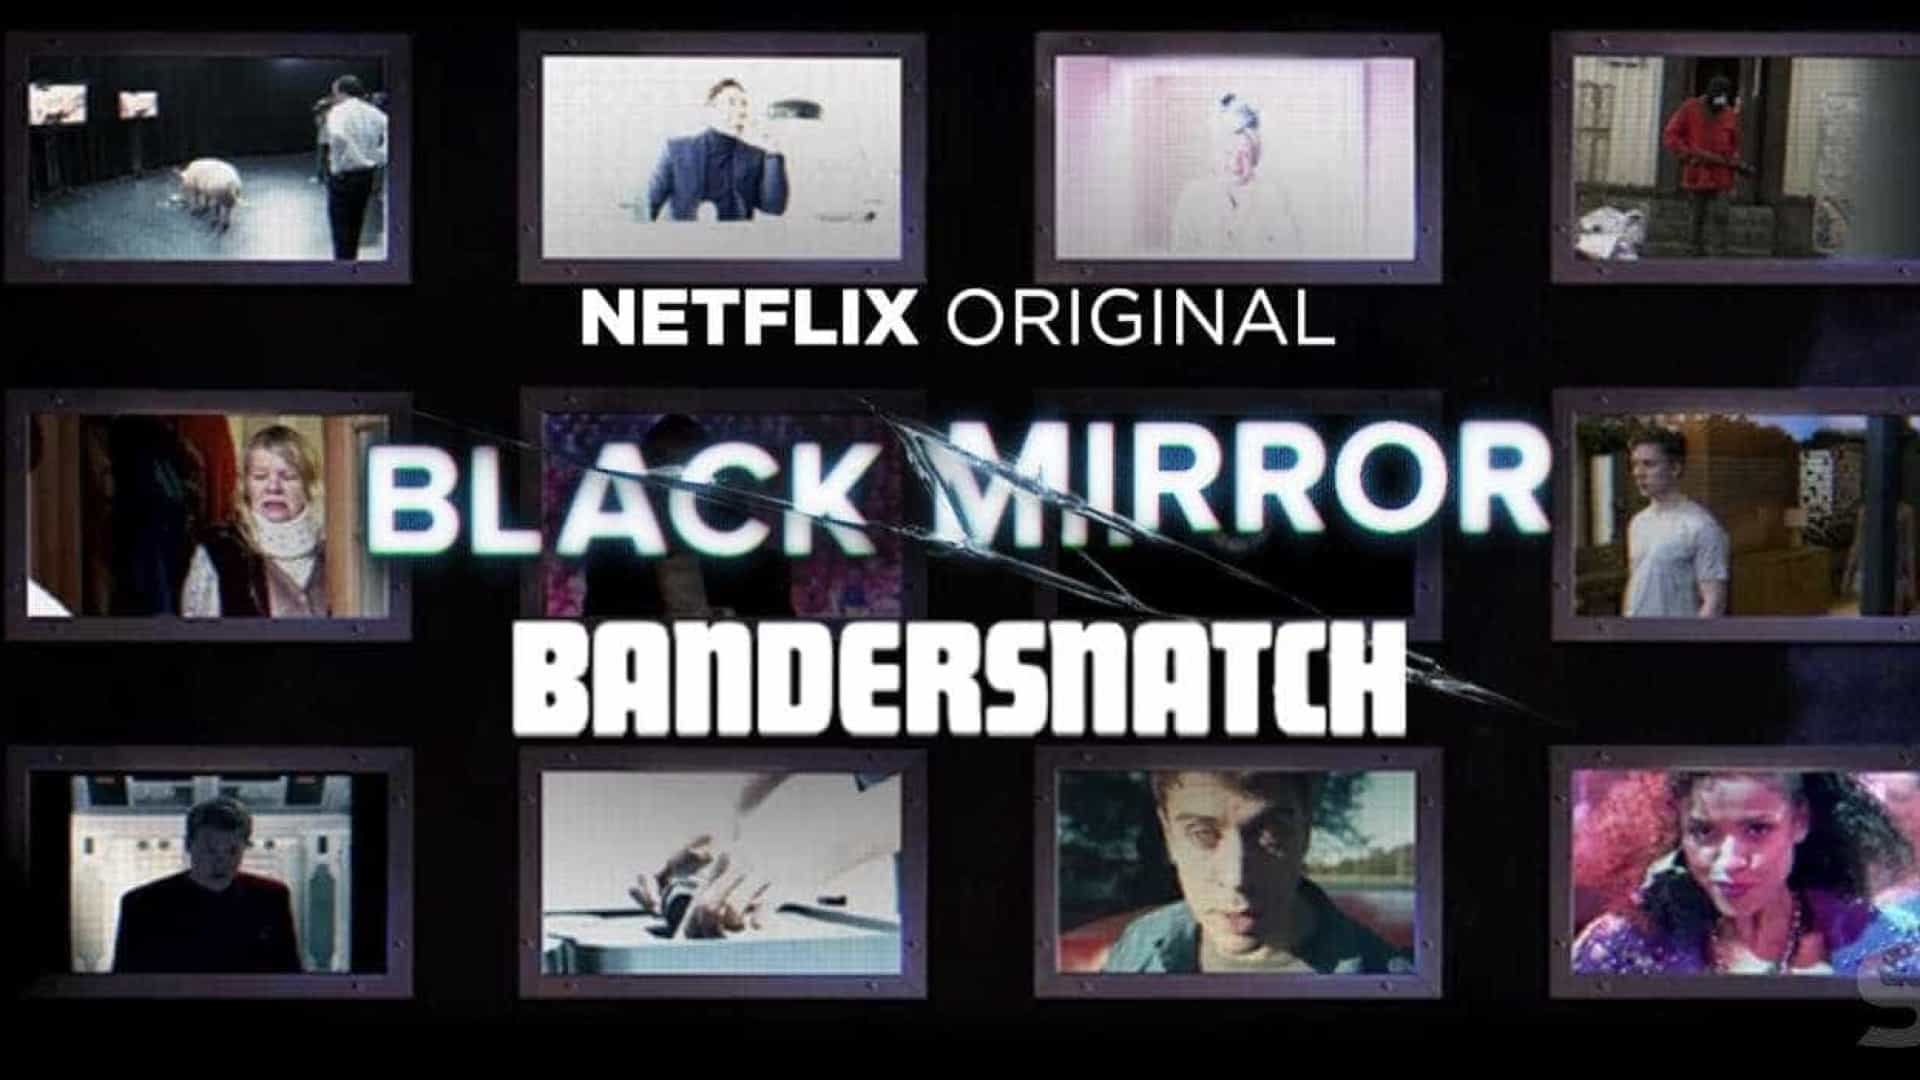 Netflix divulga trailer e de 'Black Mirror: Bandersnatch'